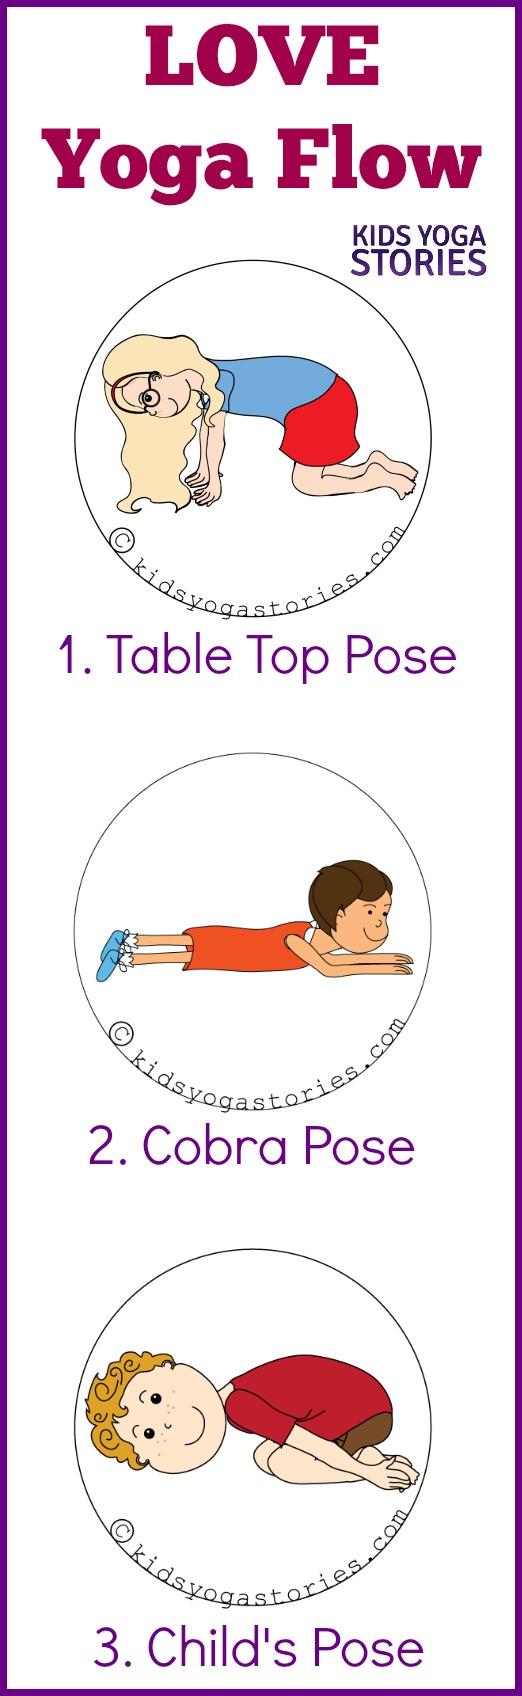 LOVE Yoga - Kids Yoga Stories  Yoga resources for kids